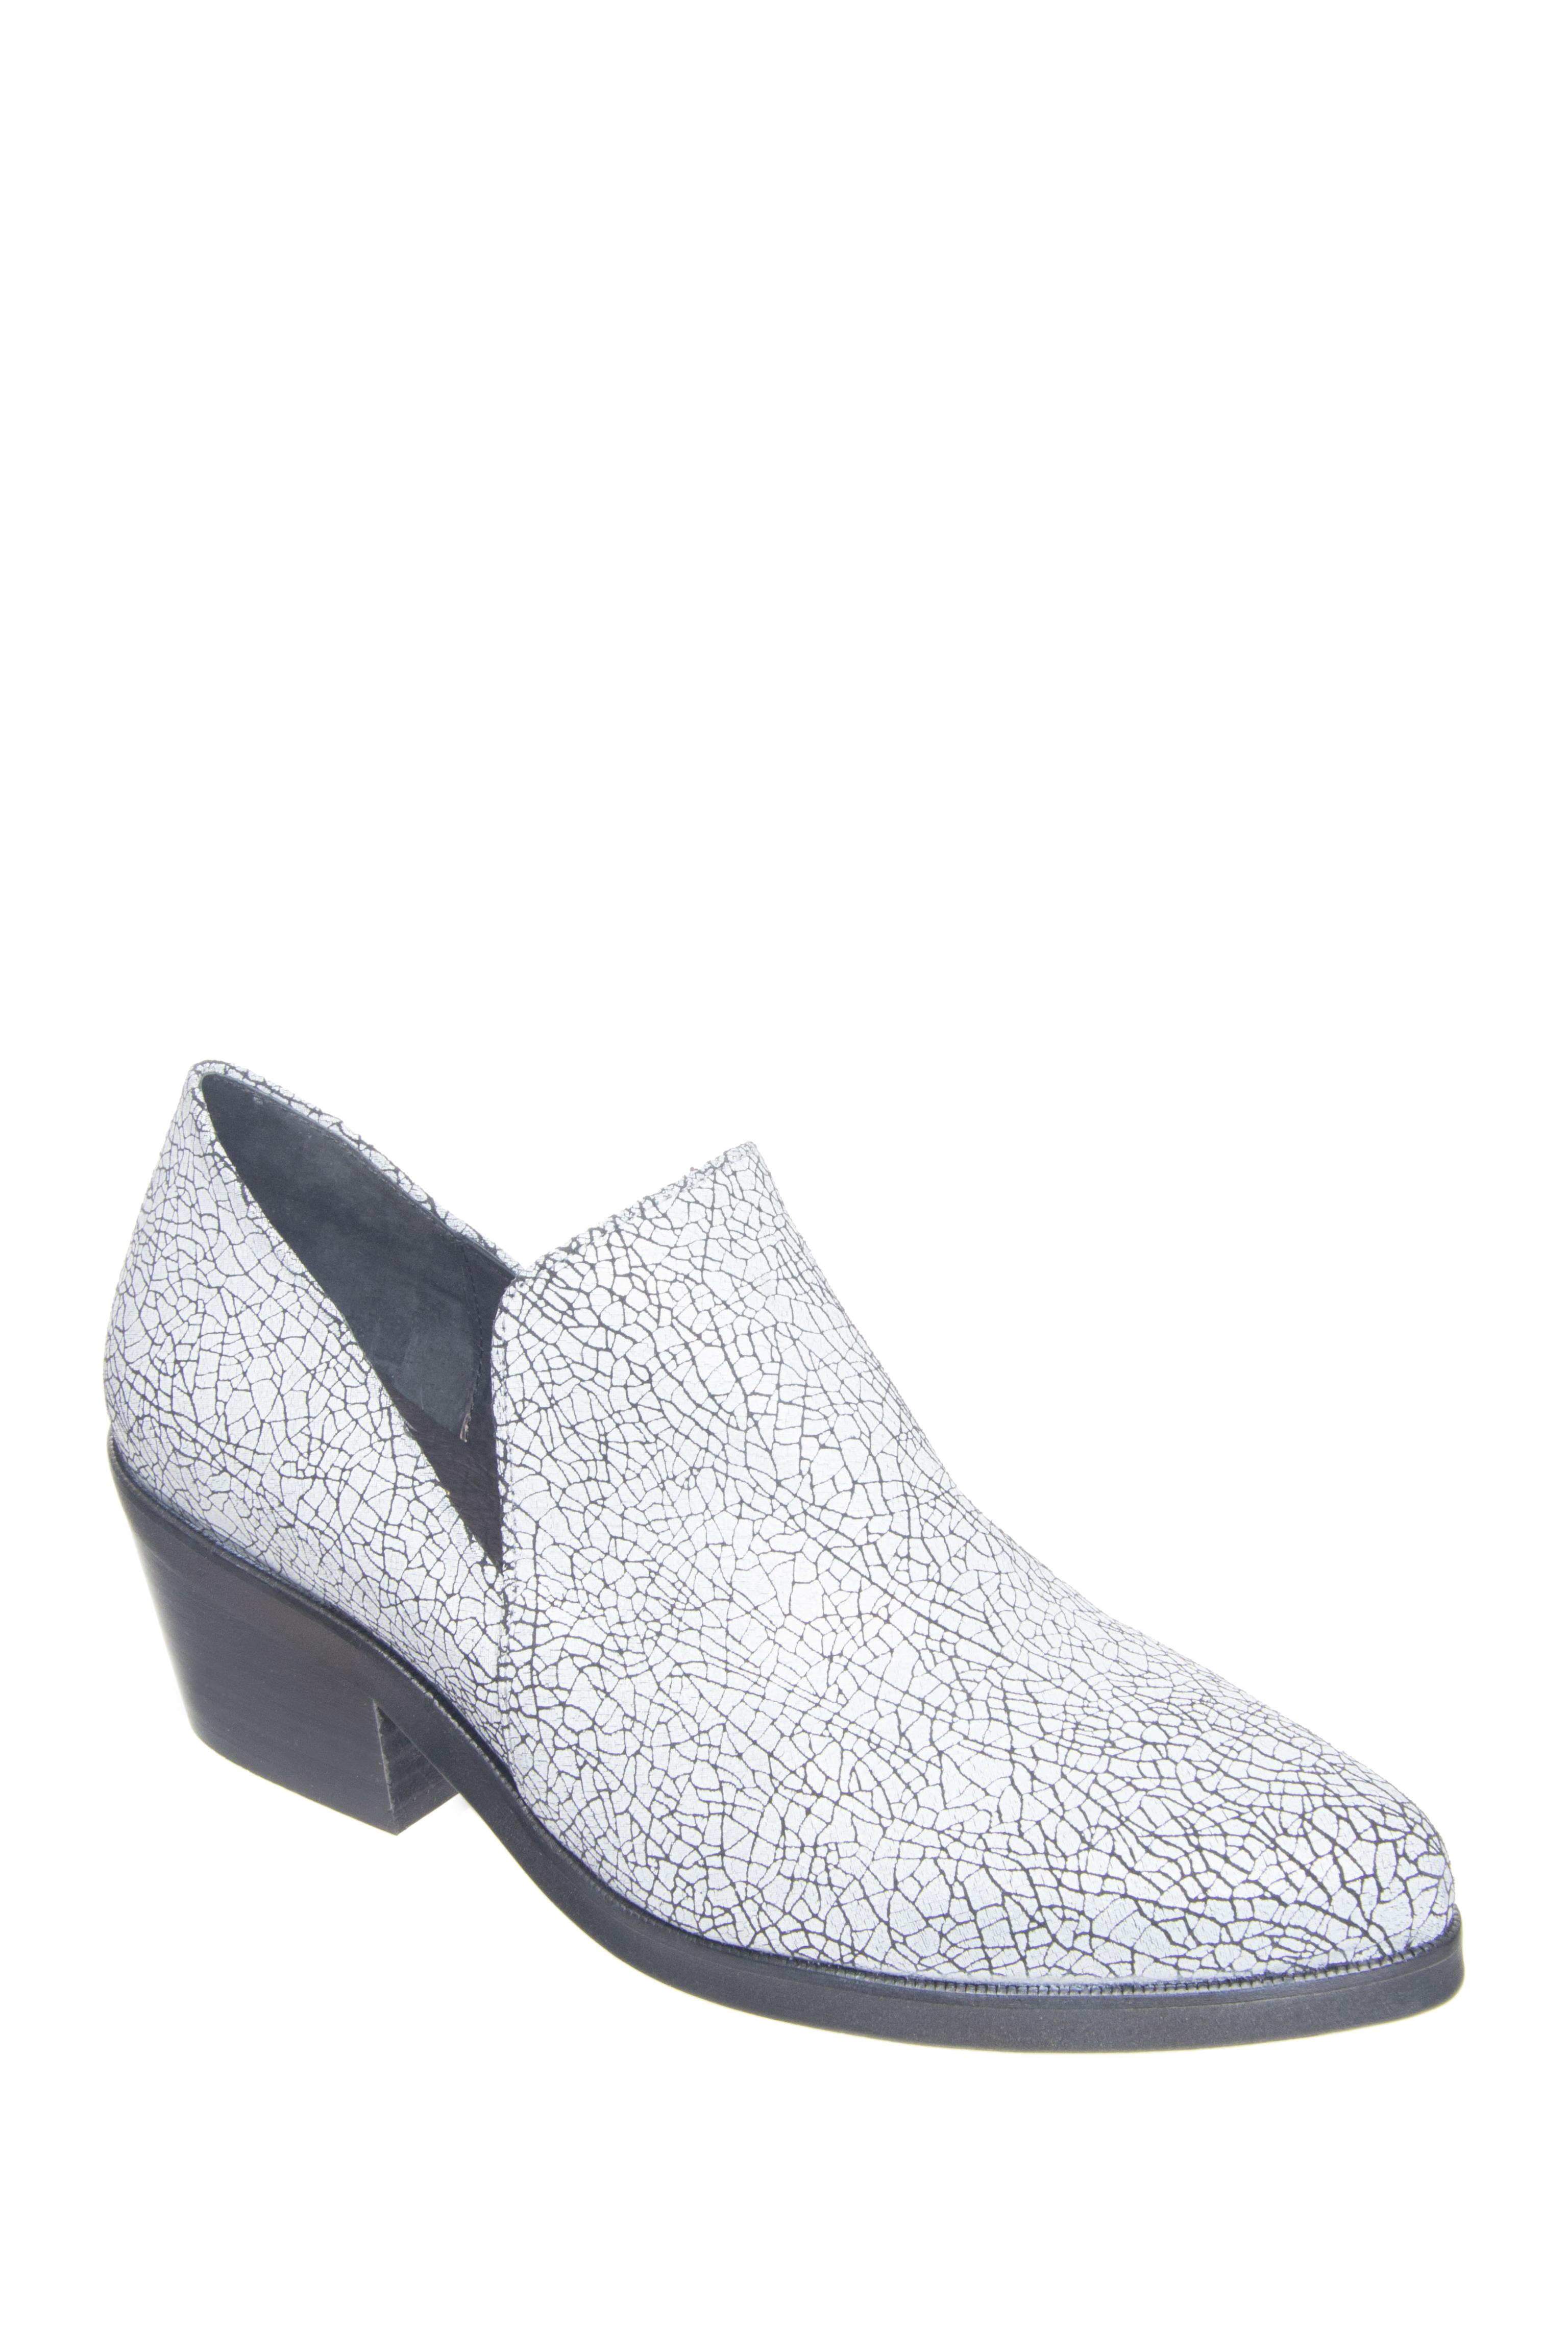 Shellys London Johnna Mid Heel Shoes - Black / White